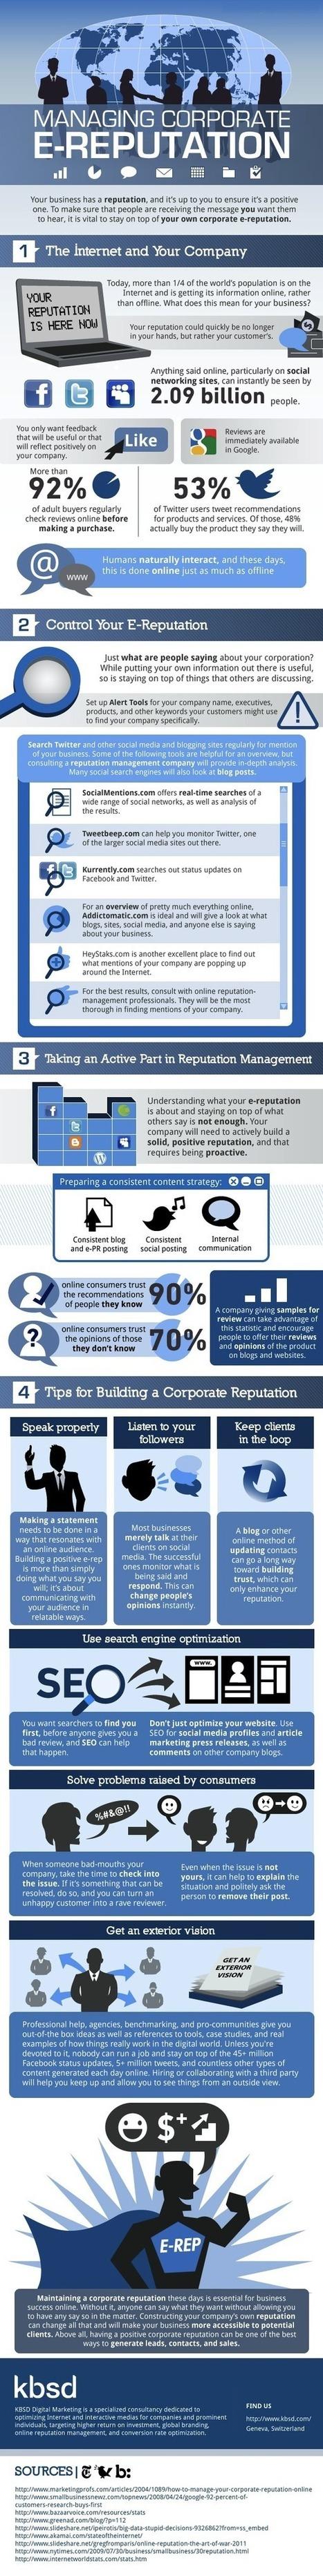 Managing Your Personal Brand Via Online Presence and Reputation |  @wendybrache | Digital Marketing Buzz | Scoop.it